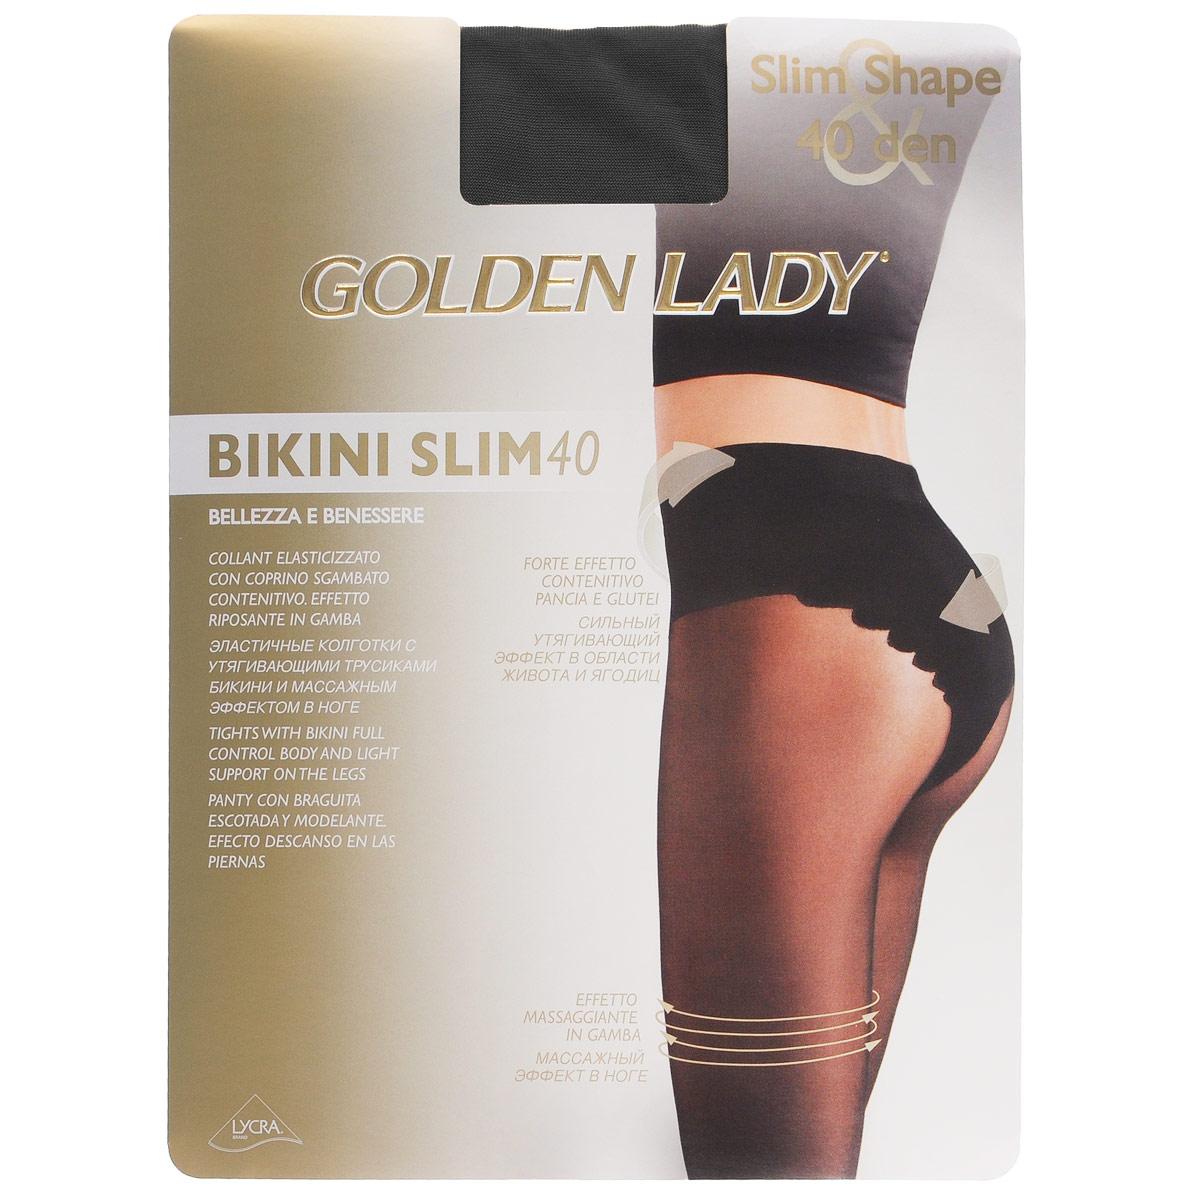 Колготки женские Golden Lady Bikini Slim 40, цвет: Nero (черный). 122LLL. Размер 4 (L) цены онлайн